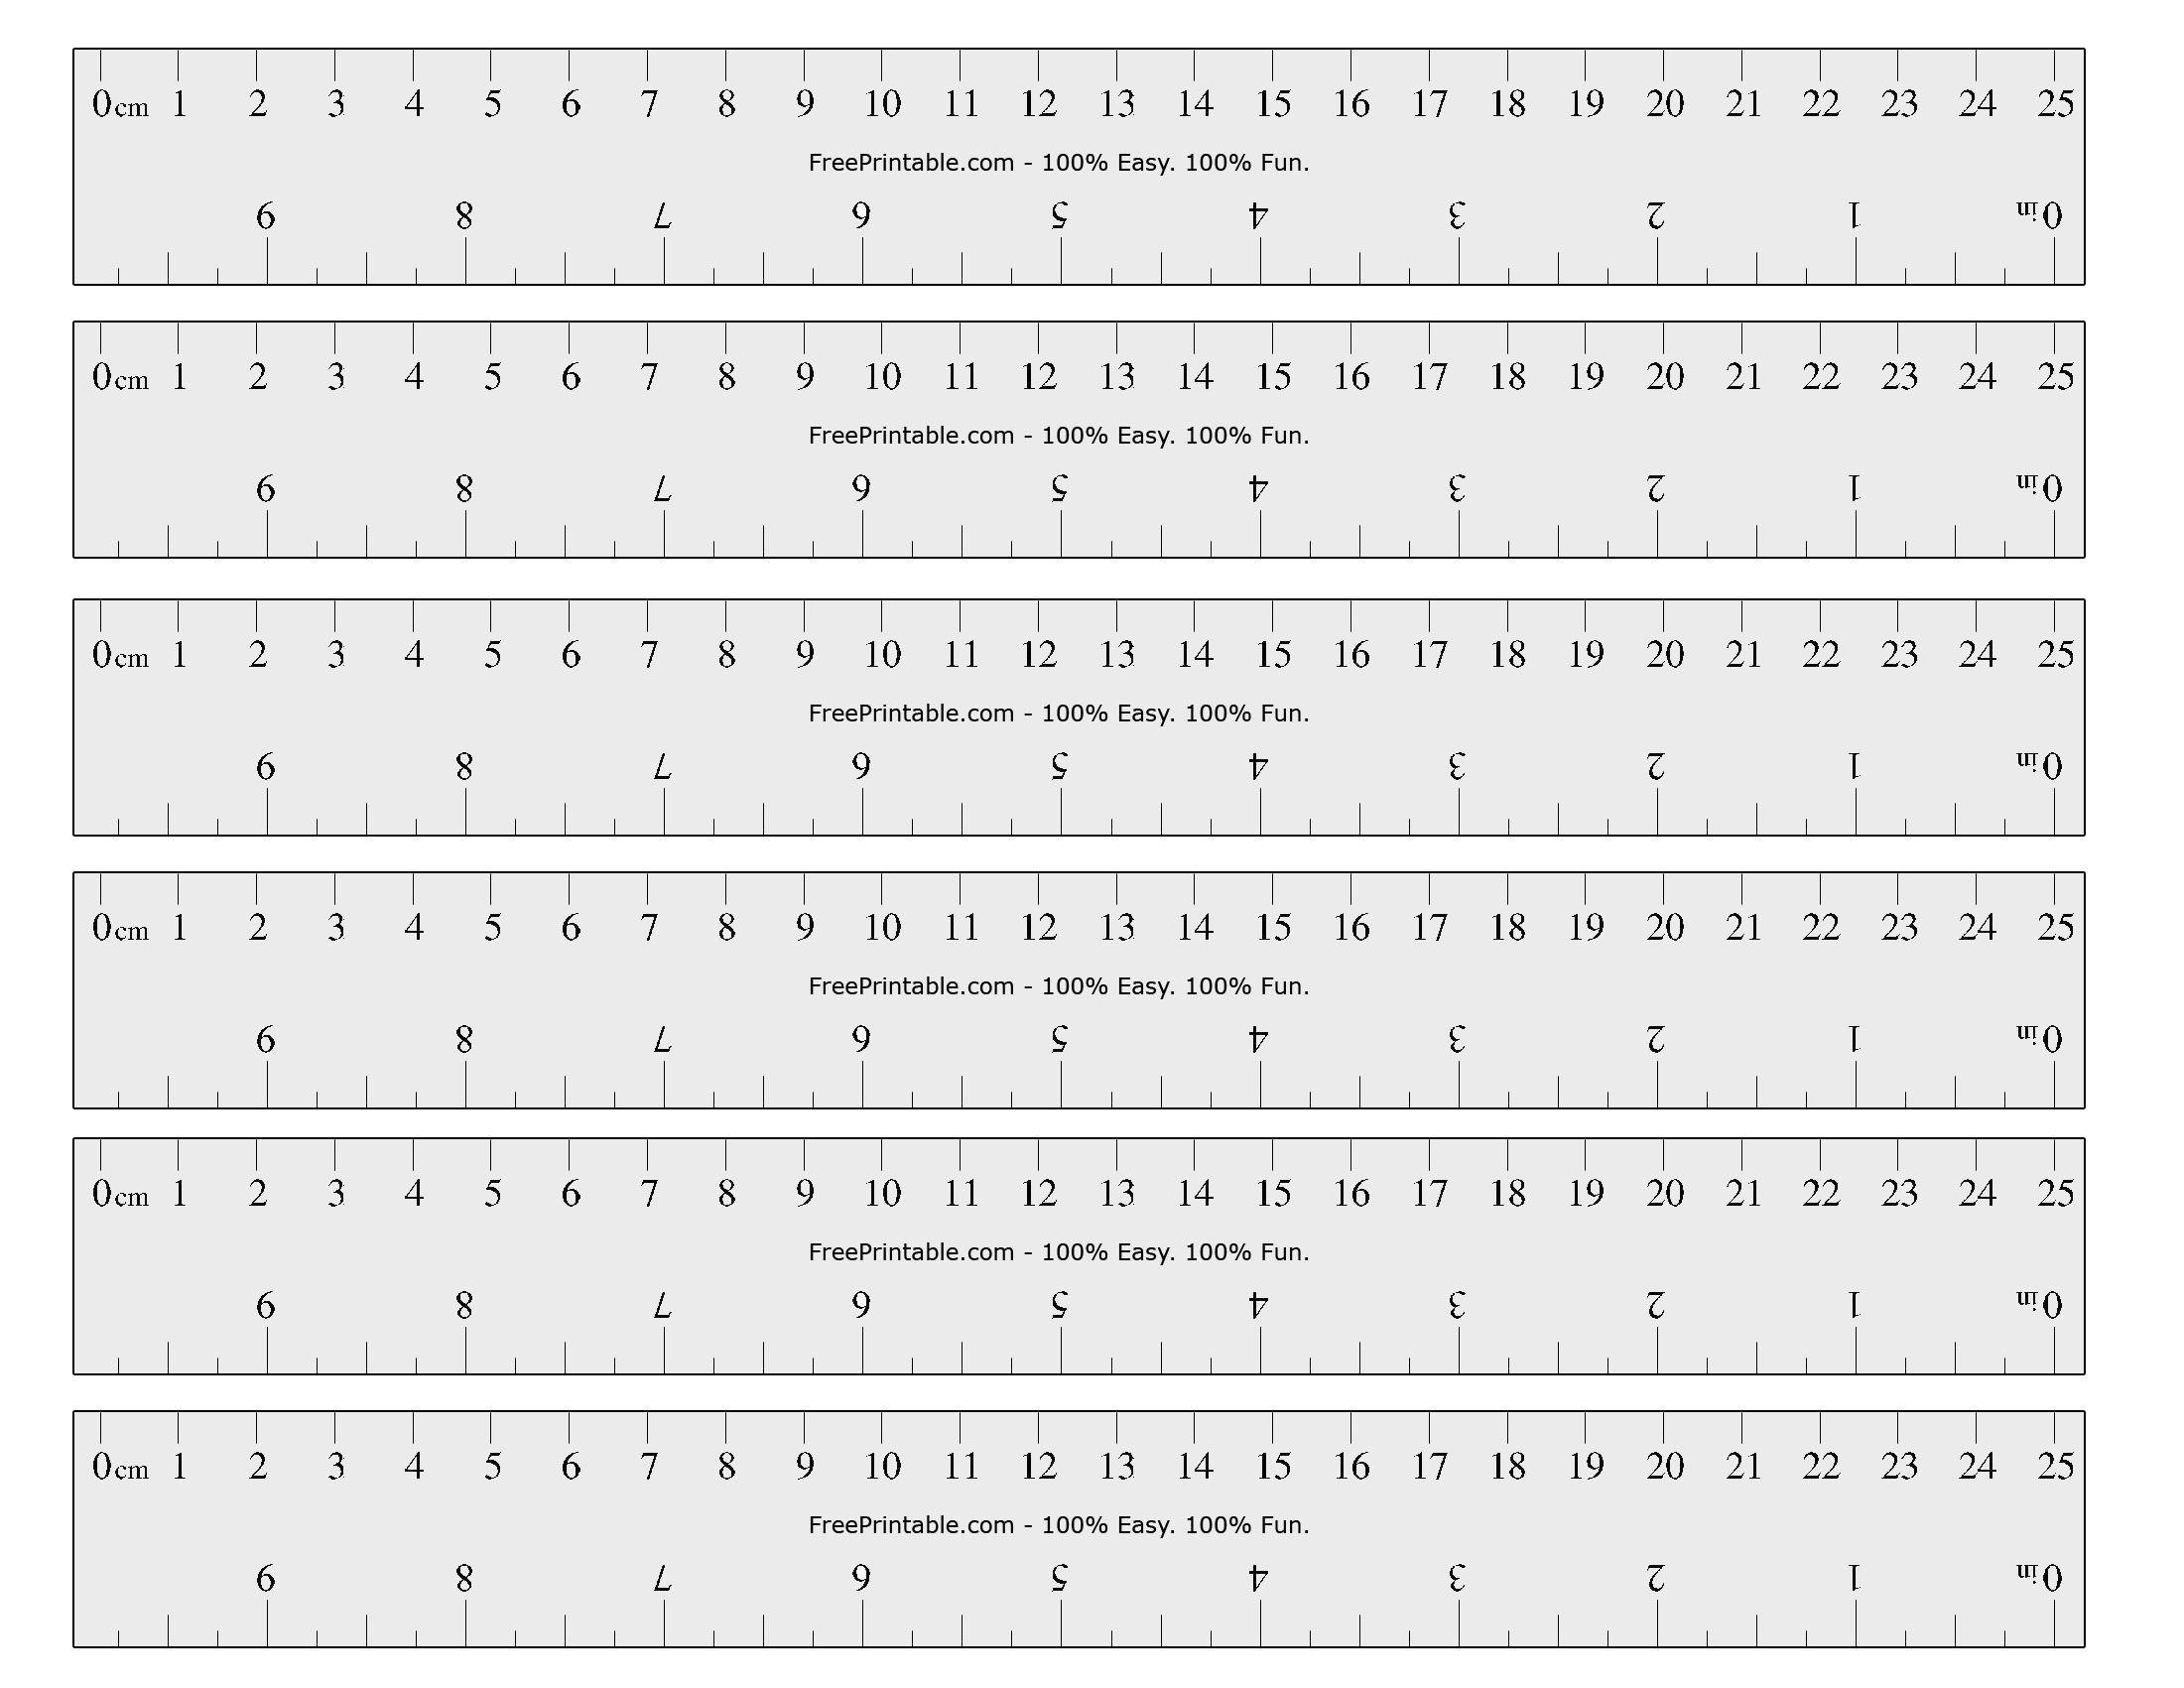 Free Printable Cm/inch Ruler | Math Mania!! - Free Printable Cm Ruler